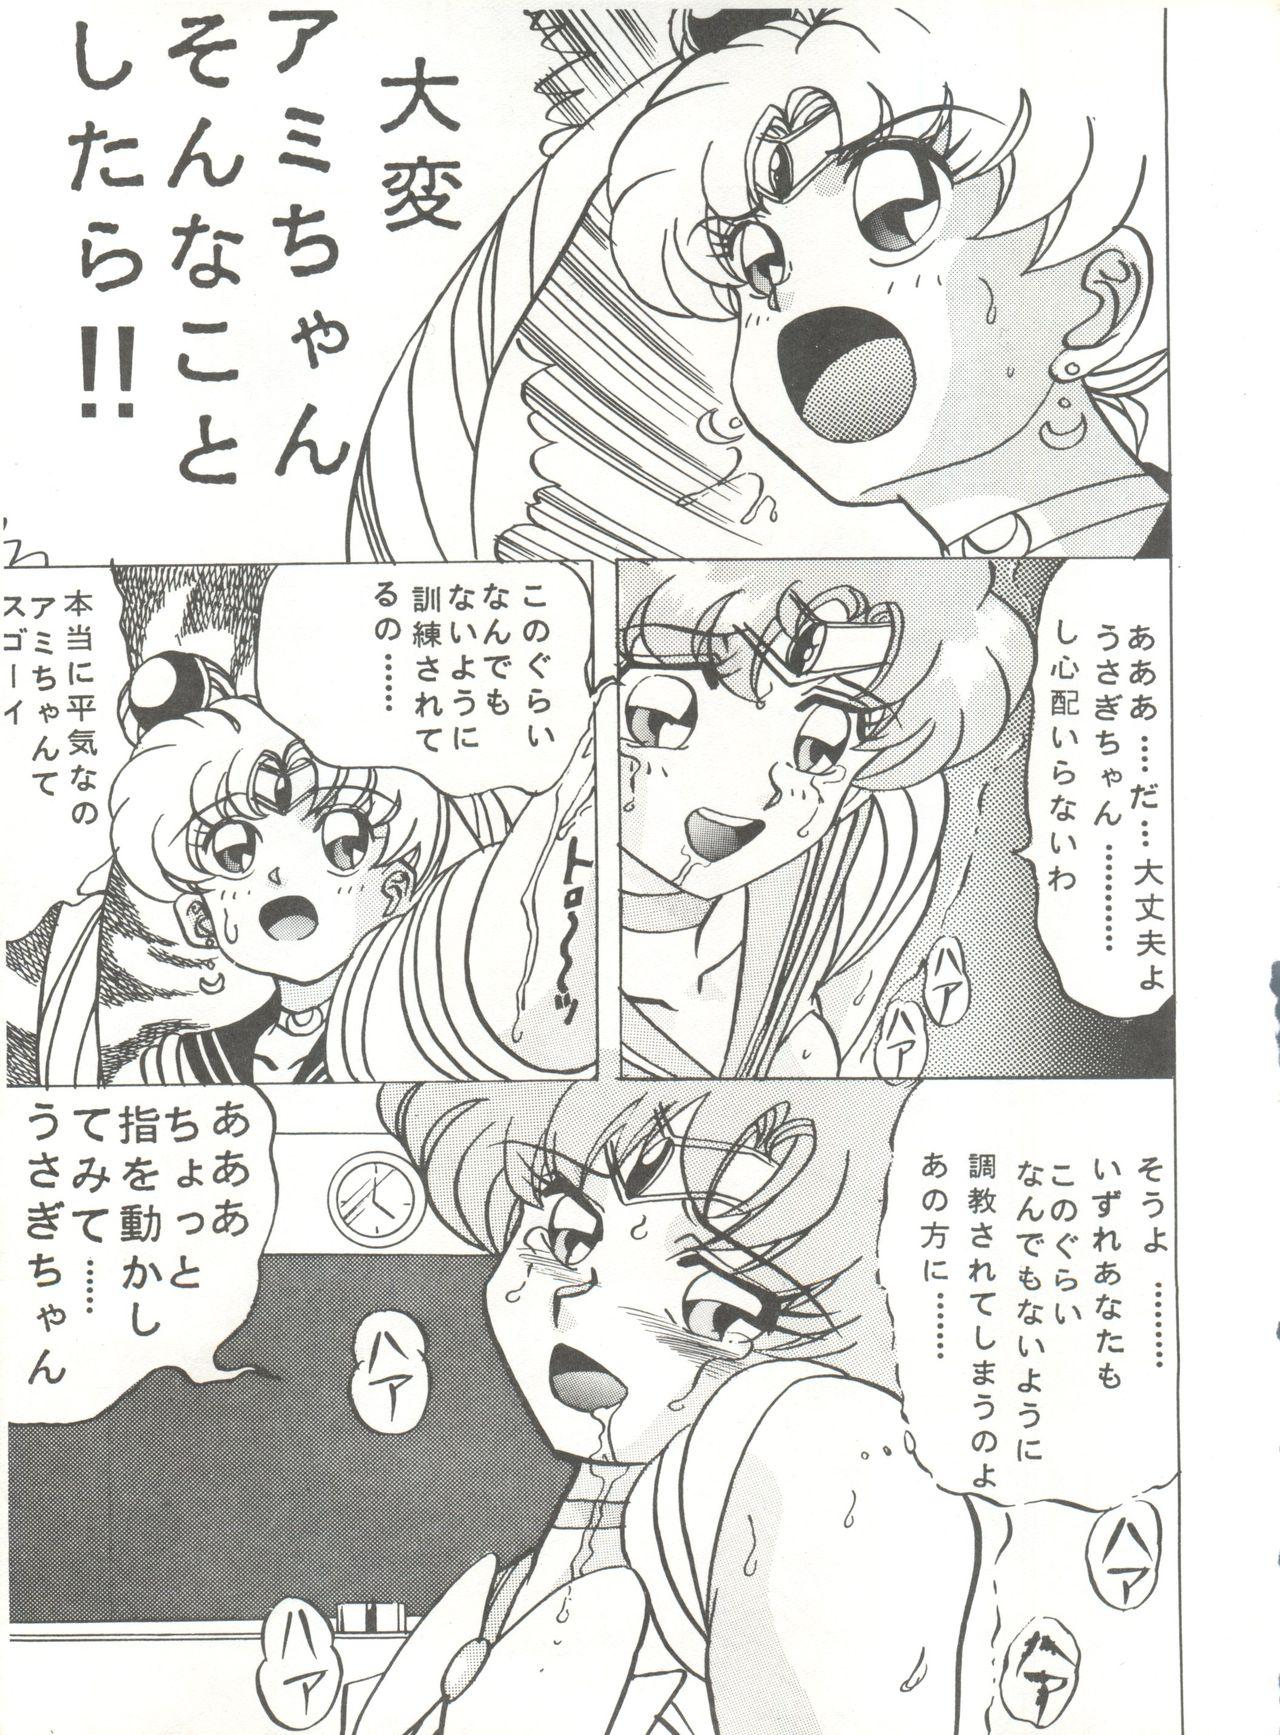 [Global One (MARO)] Sadistic 5 (Cutey Honey, Devilman, Sailor Moon), [Global One (MARO)] Sadistic (Dirty Pair, Fushigi no Umi no Nadia, Sailor Moon), [Studio Ikkatsumajin] .ribbon (Hime-chan's Ribbon) 56